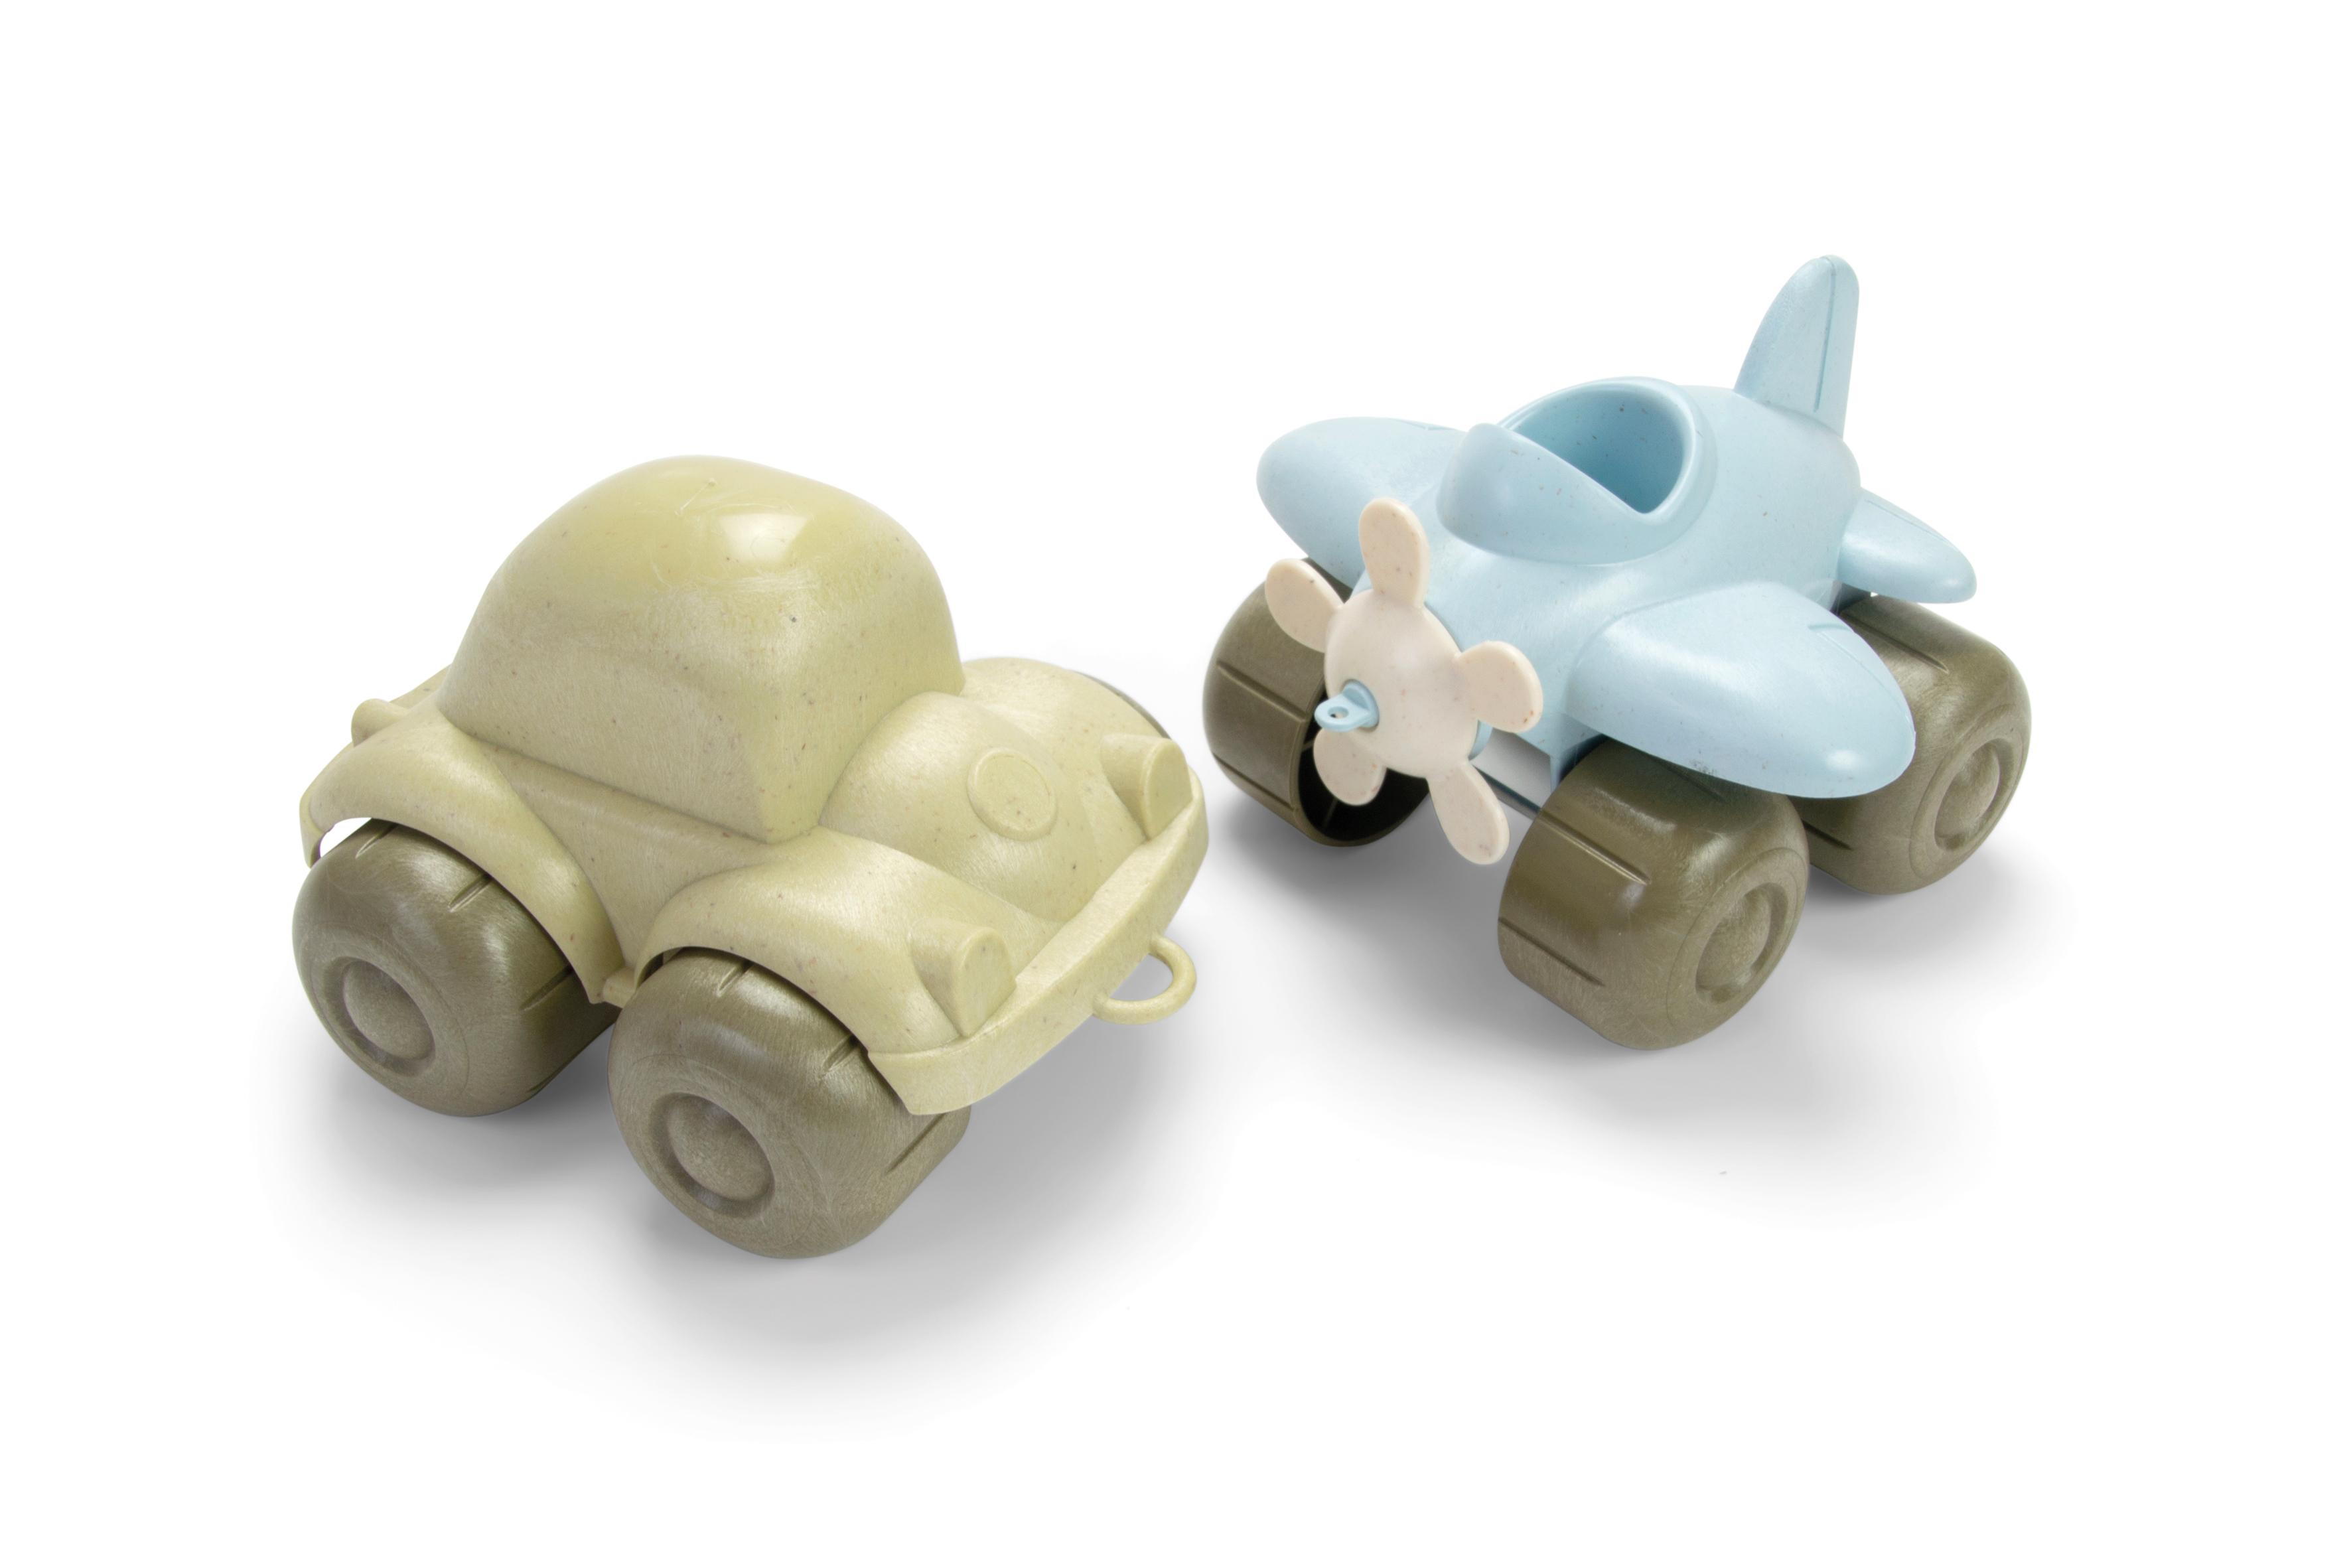 Dantoy - BIOPlast - Vehicles - Car & Plane (5625B)